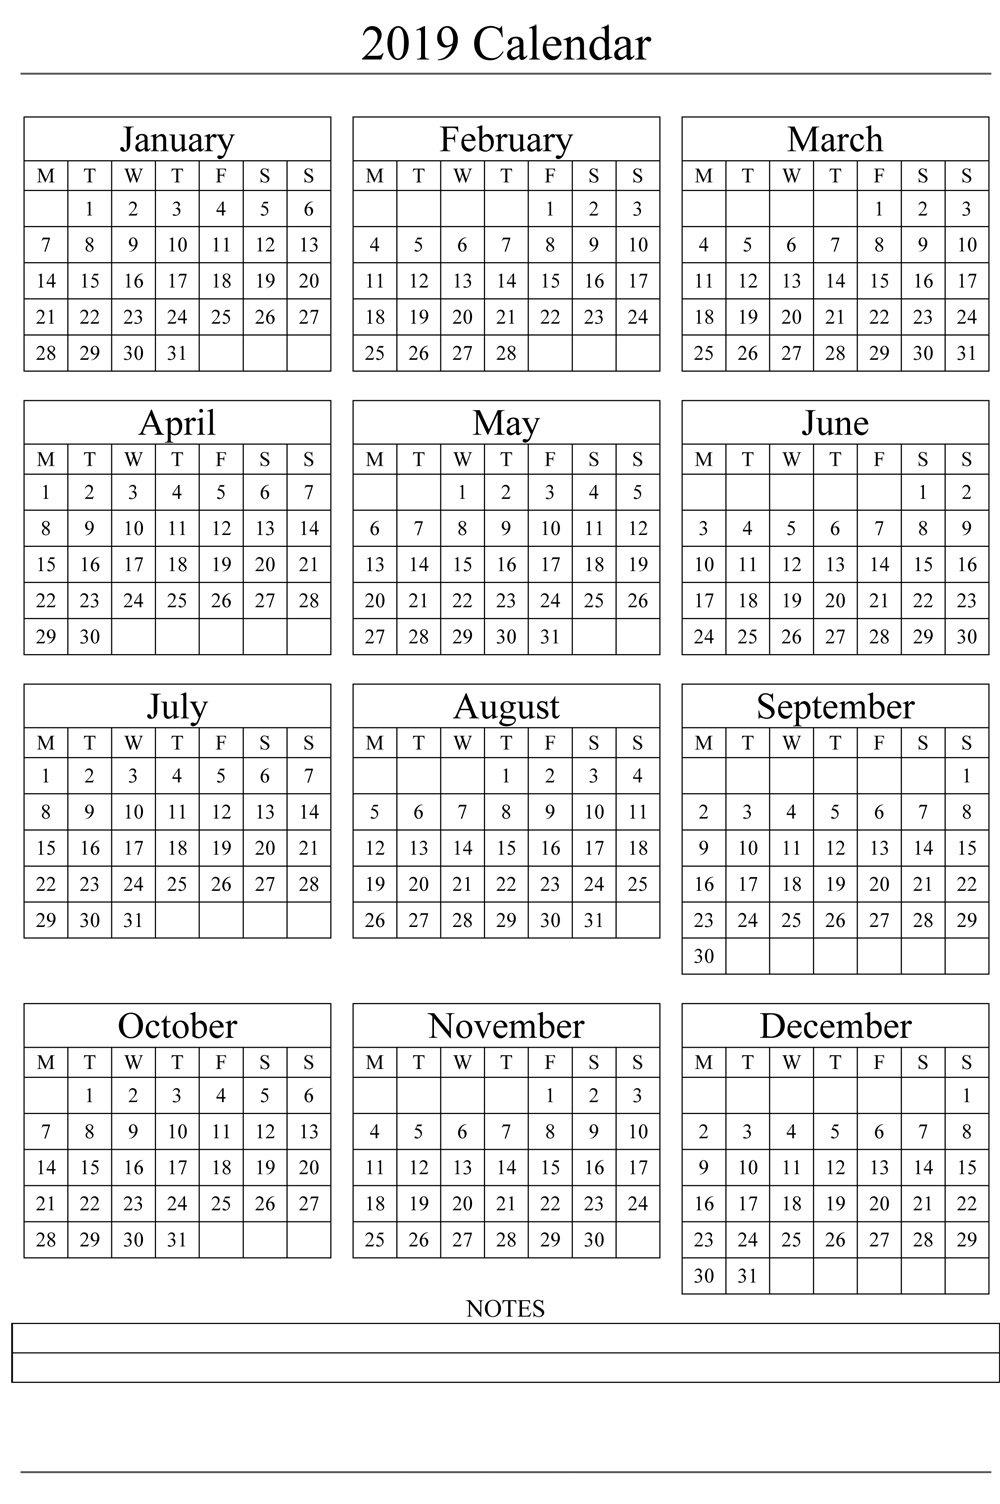 2019 Yearly Calendar Printable Templates - Holidays, Pdf Word Excel - Calendar Hour - 2020 within Yrdsb Calendar 2019 2021 Photo